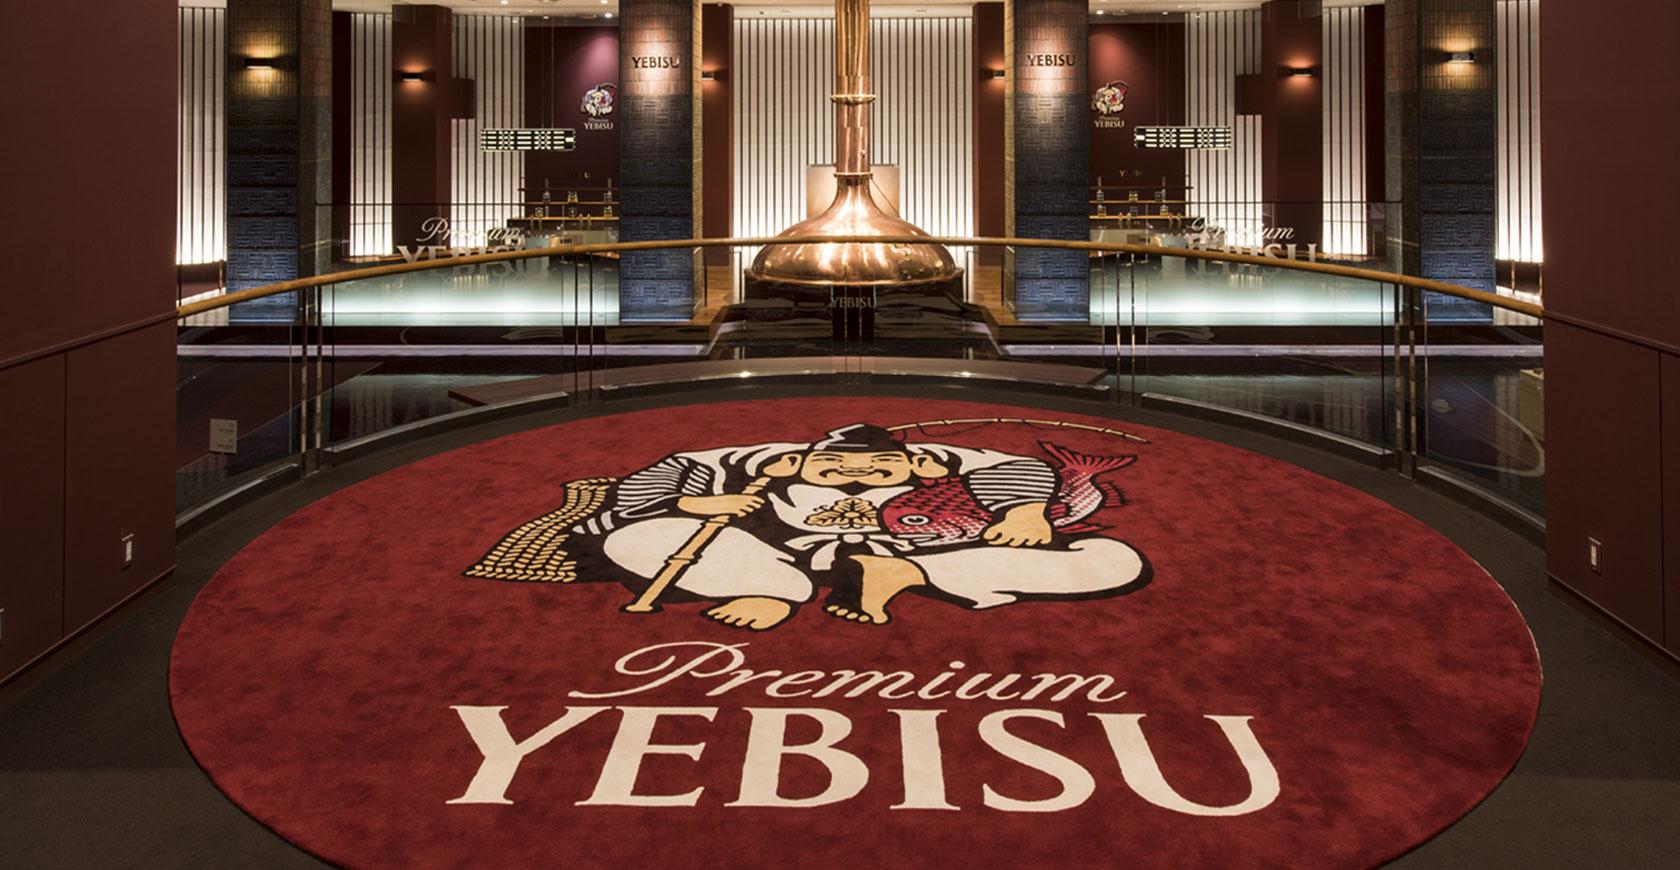 Yebisu Beer Brewery